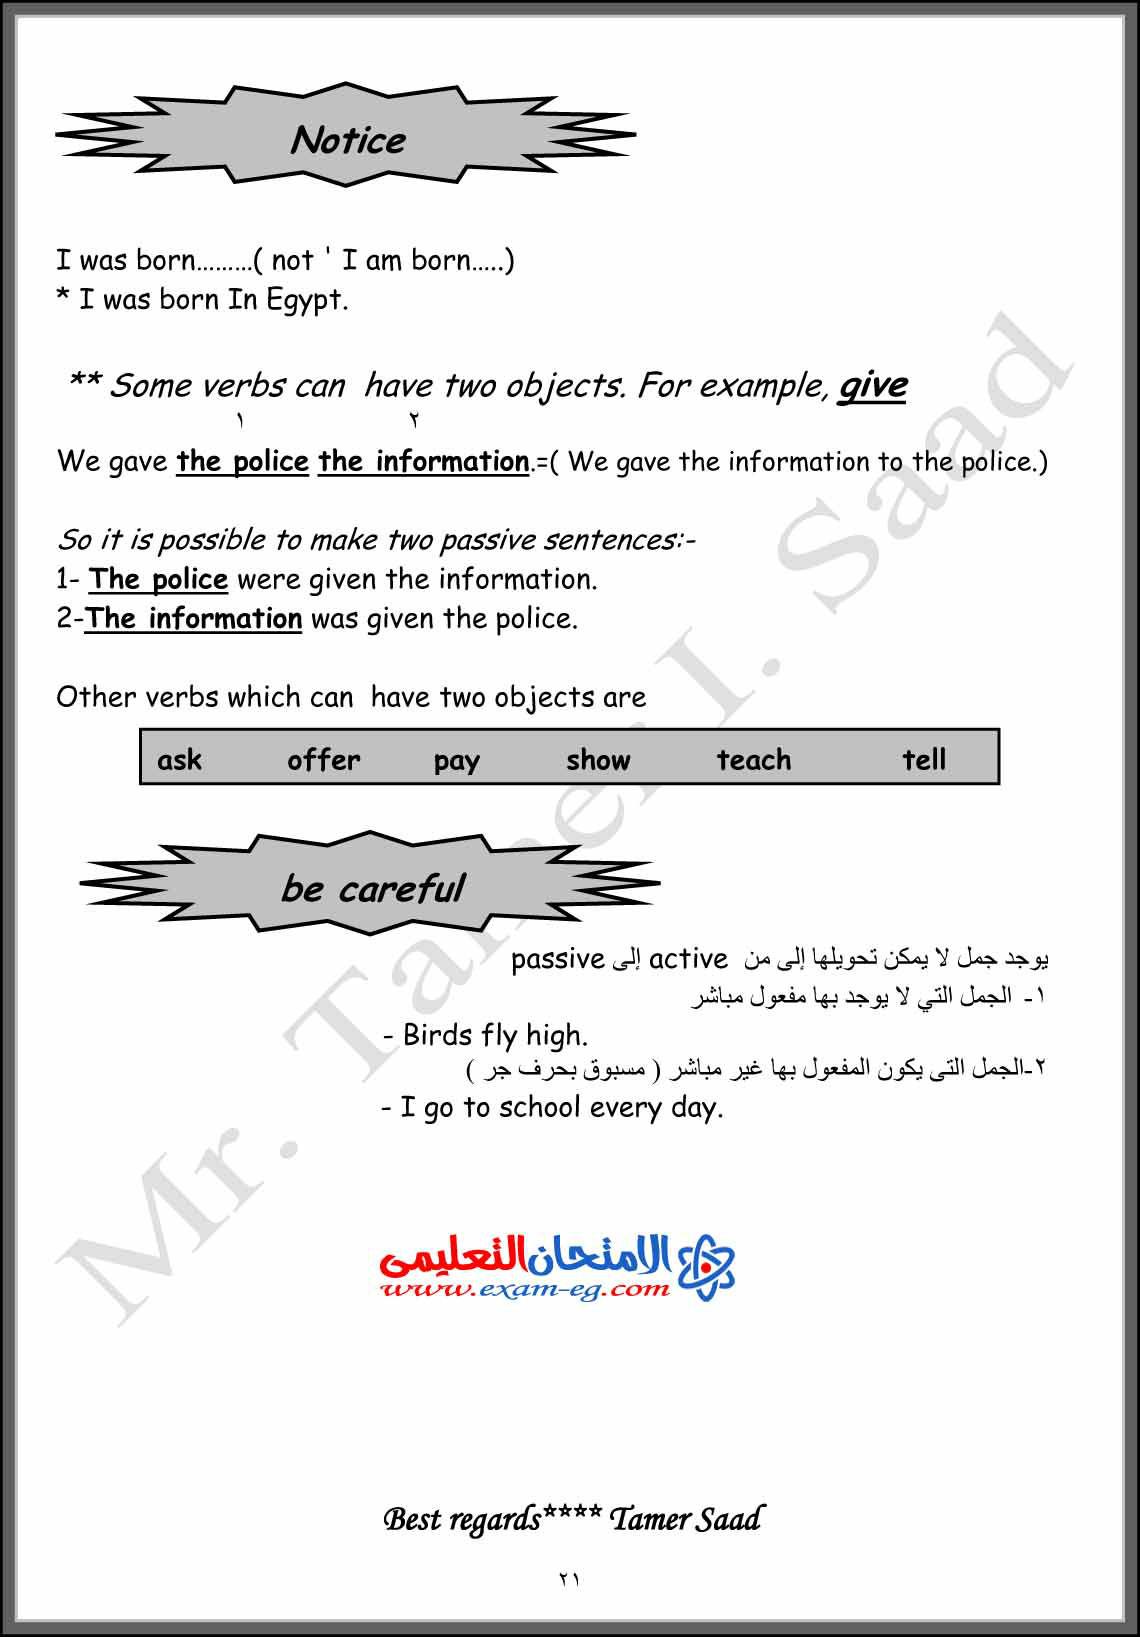 exam-eg.com_1444669918611.jpg